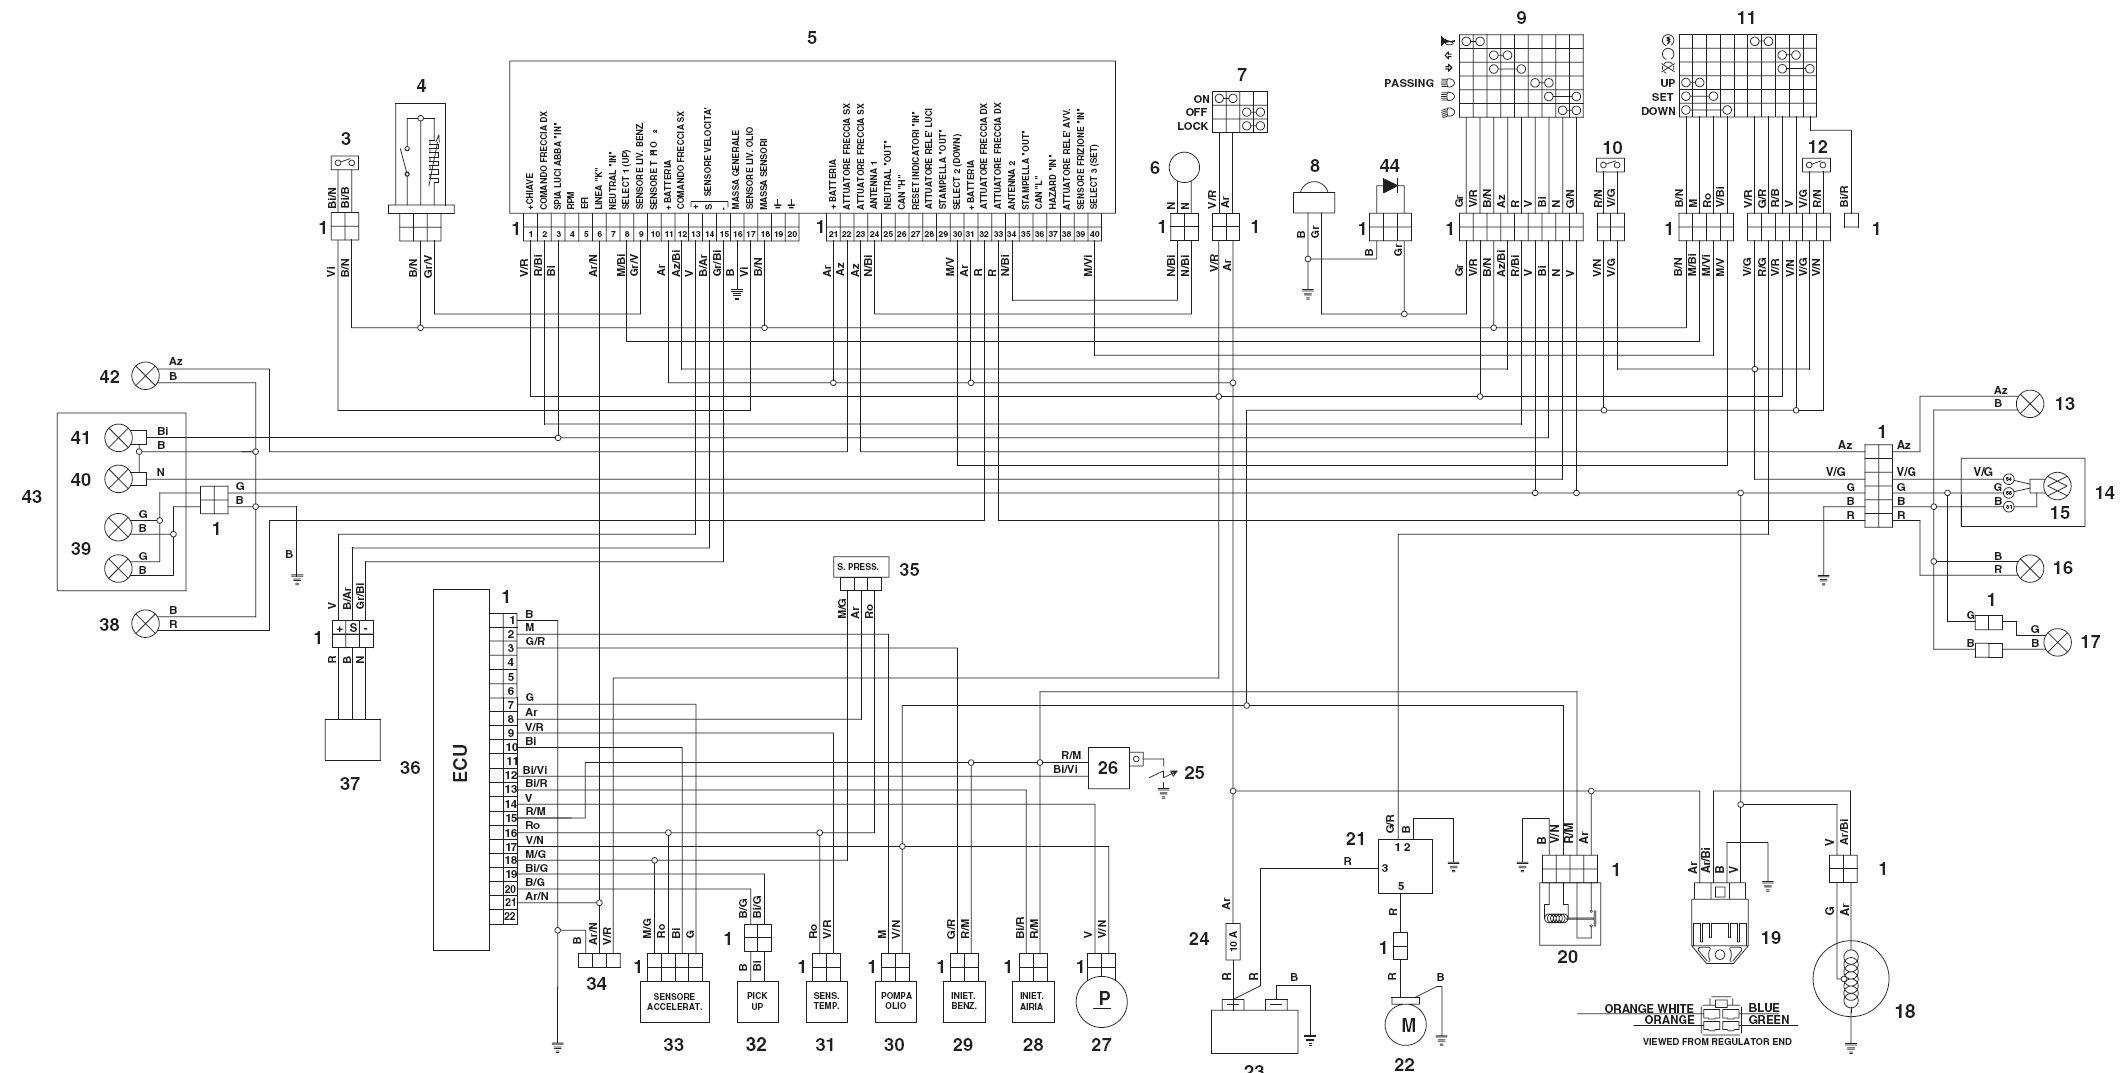 DIAGRAM] Aprilia Ditech Wiring Diagram FULL Version HD Quality Wiring  Diagram - CDIAGRAM.SHIA-LABEOUF.FRDiagram Database - Shia LaBeouf